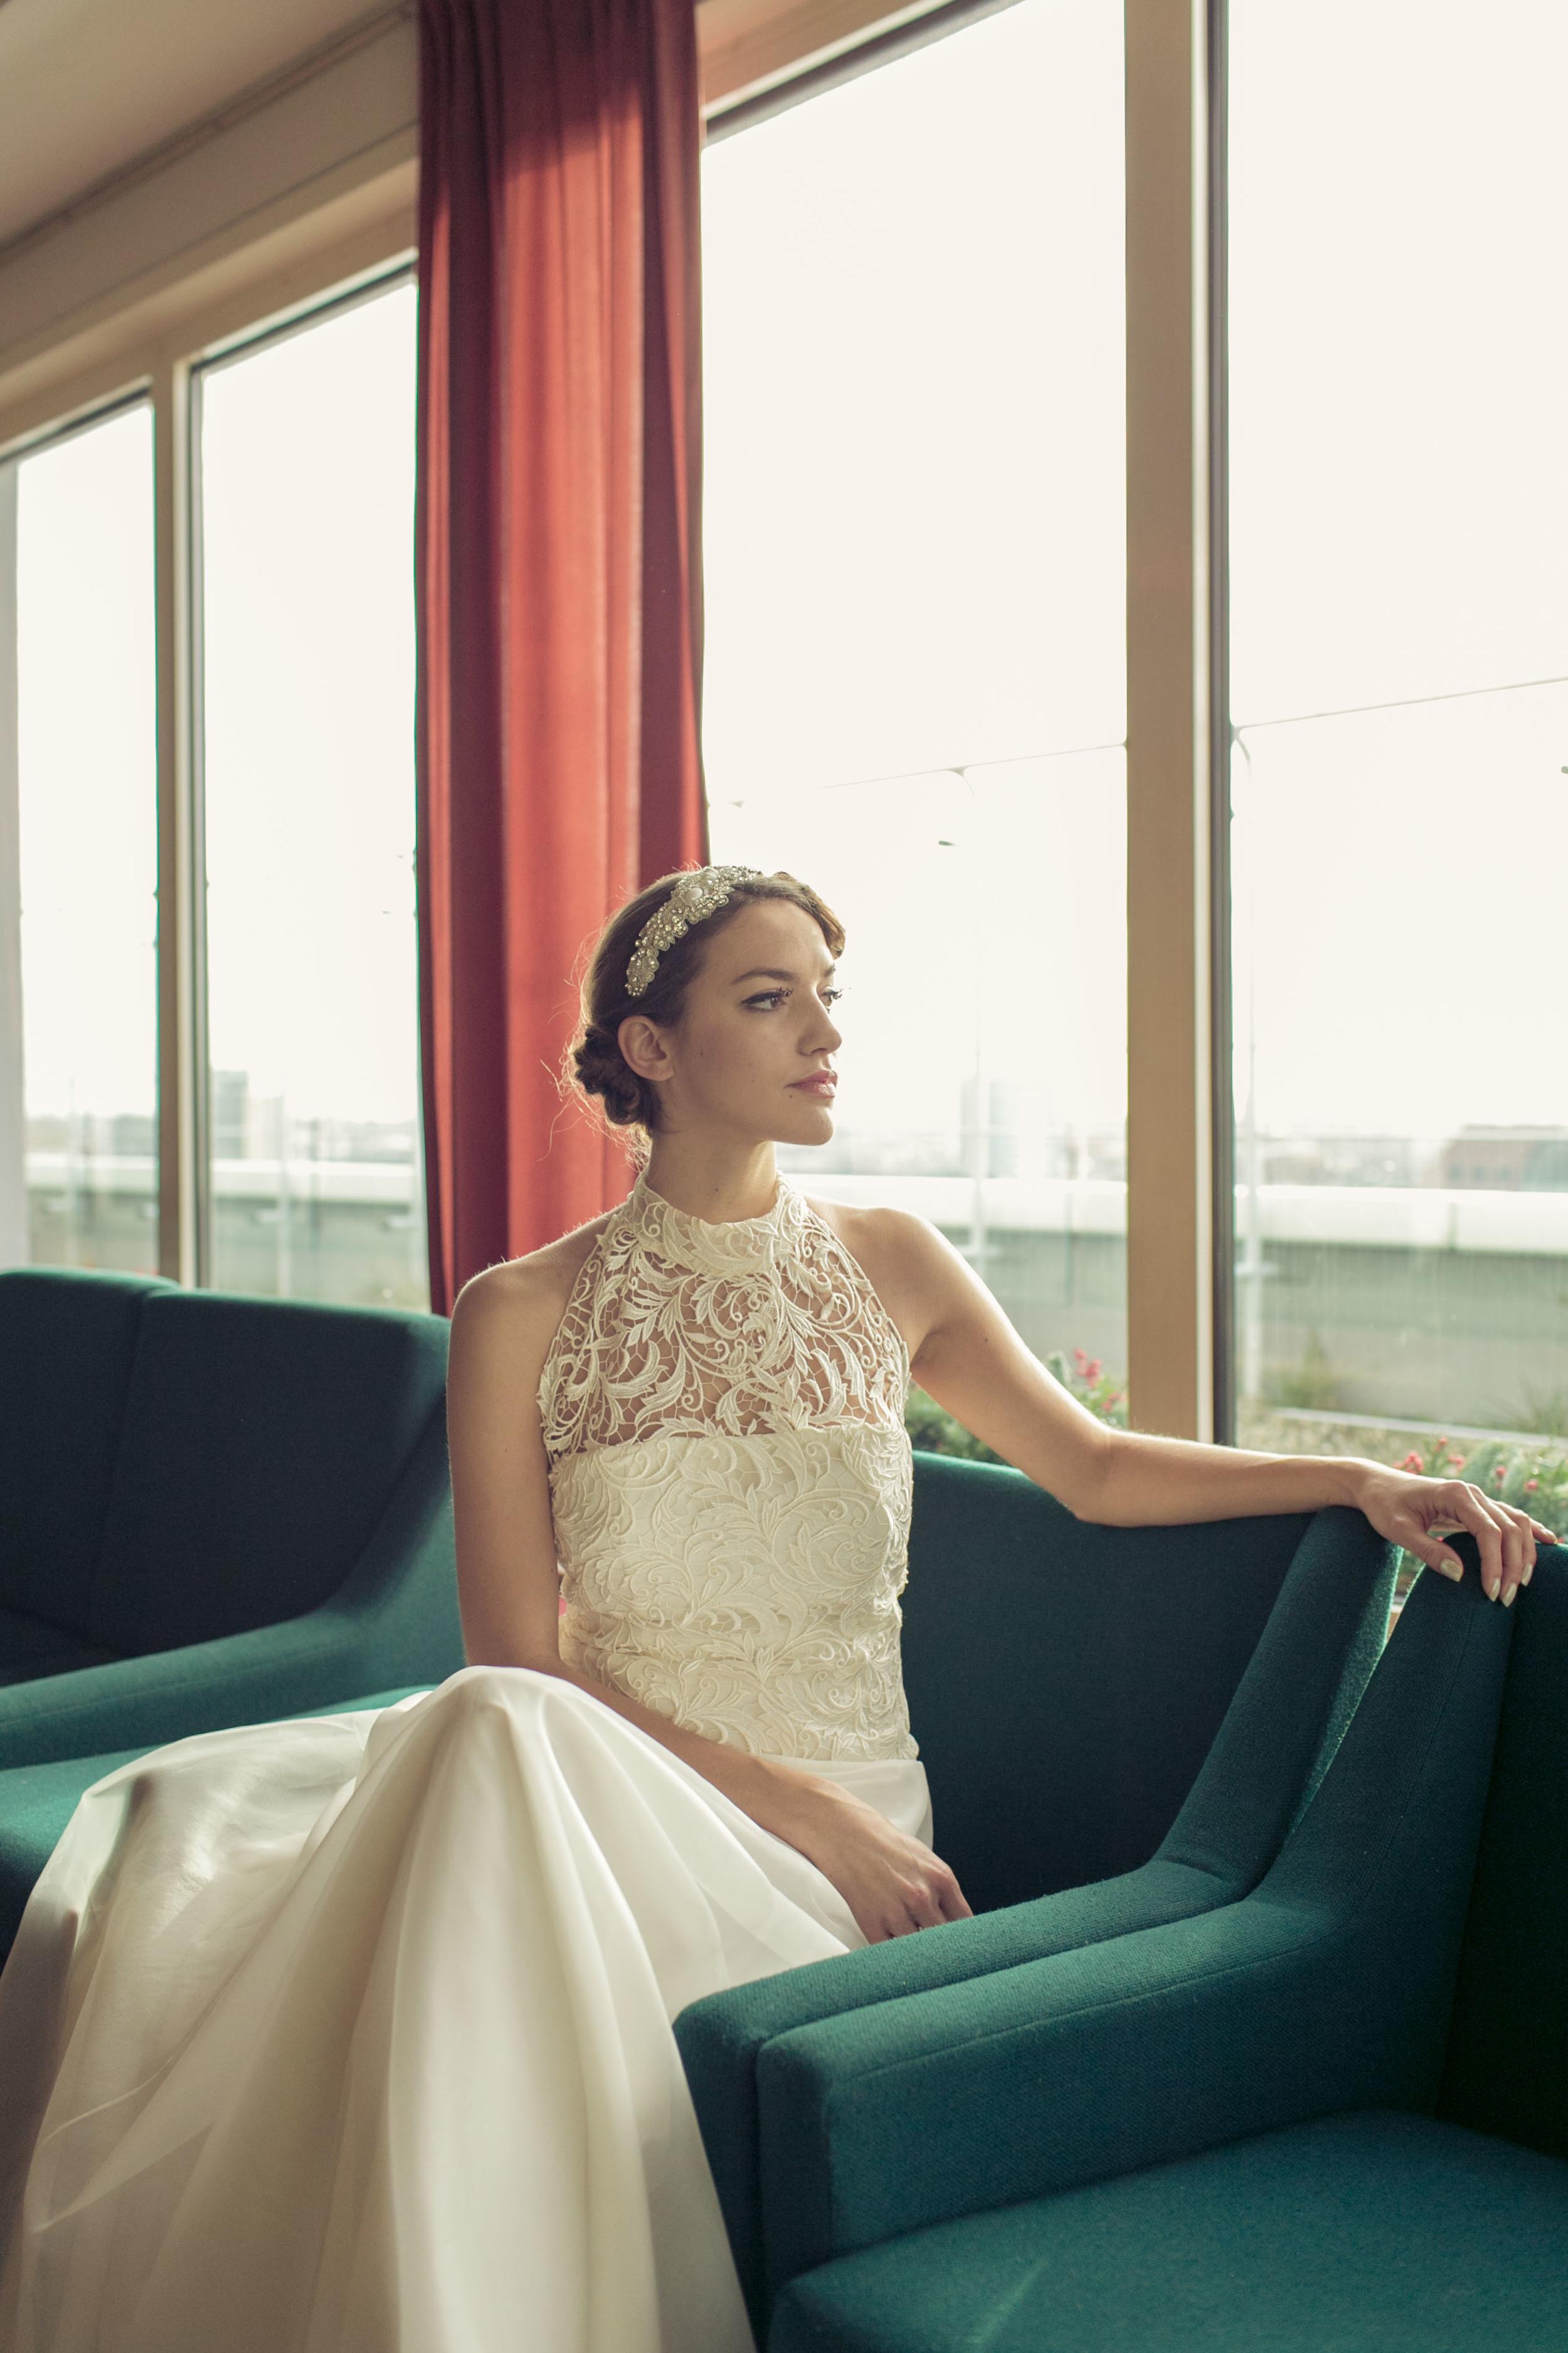 Pan Am Lounge_Hochzeitsfotografie Berlin-12.jpg